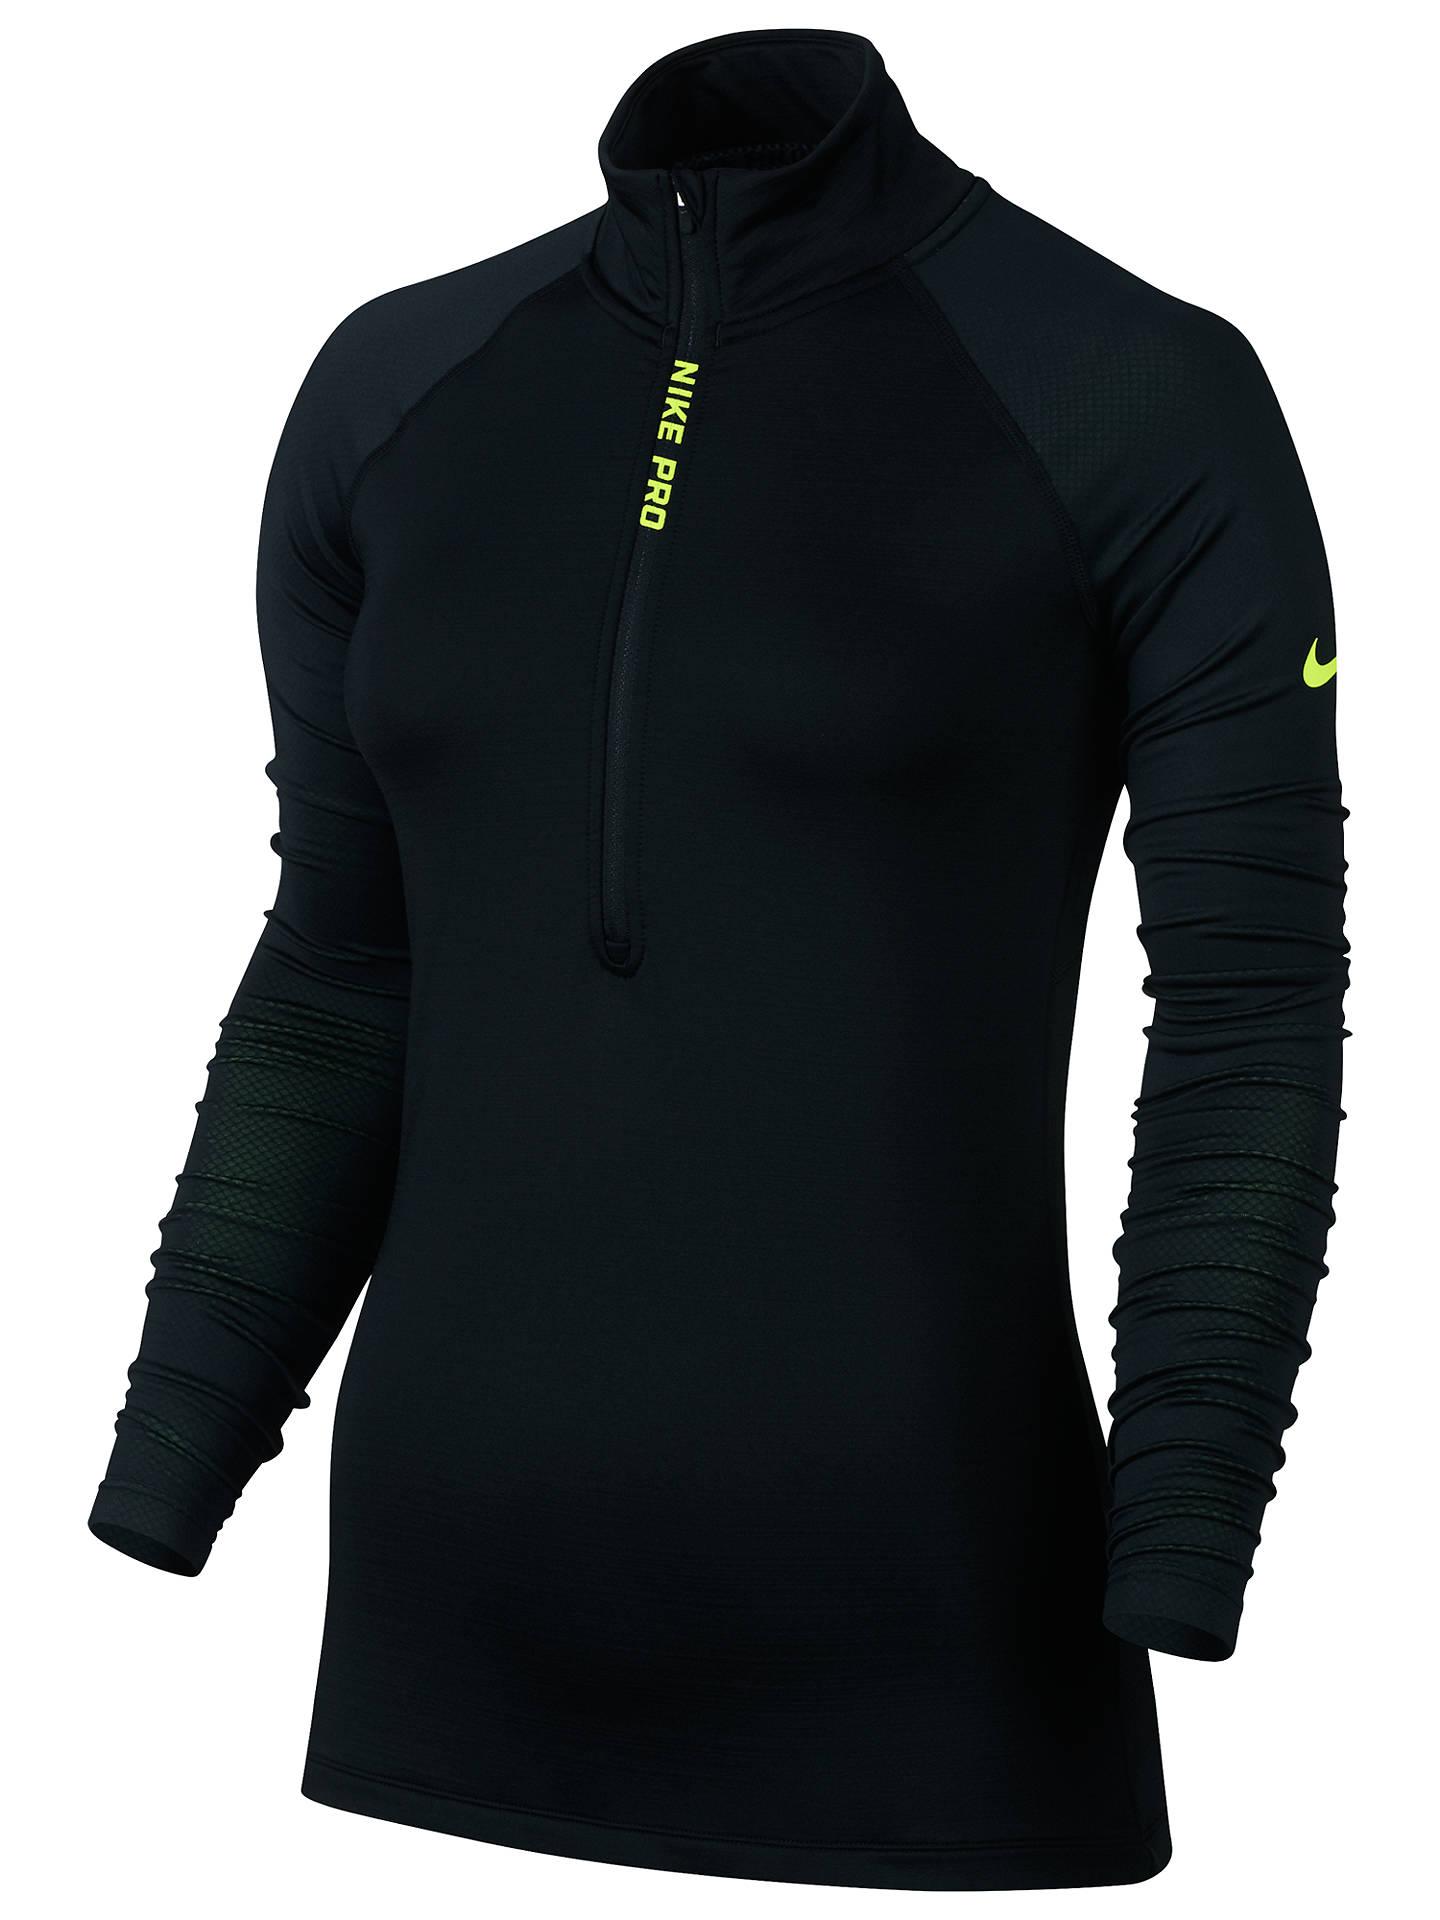 0facc44974a Buy Nike Pro Hyperwarm Half Zip Training Top